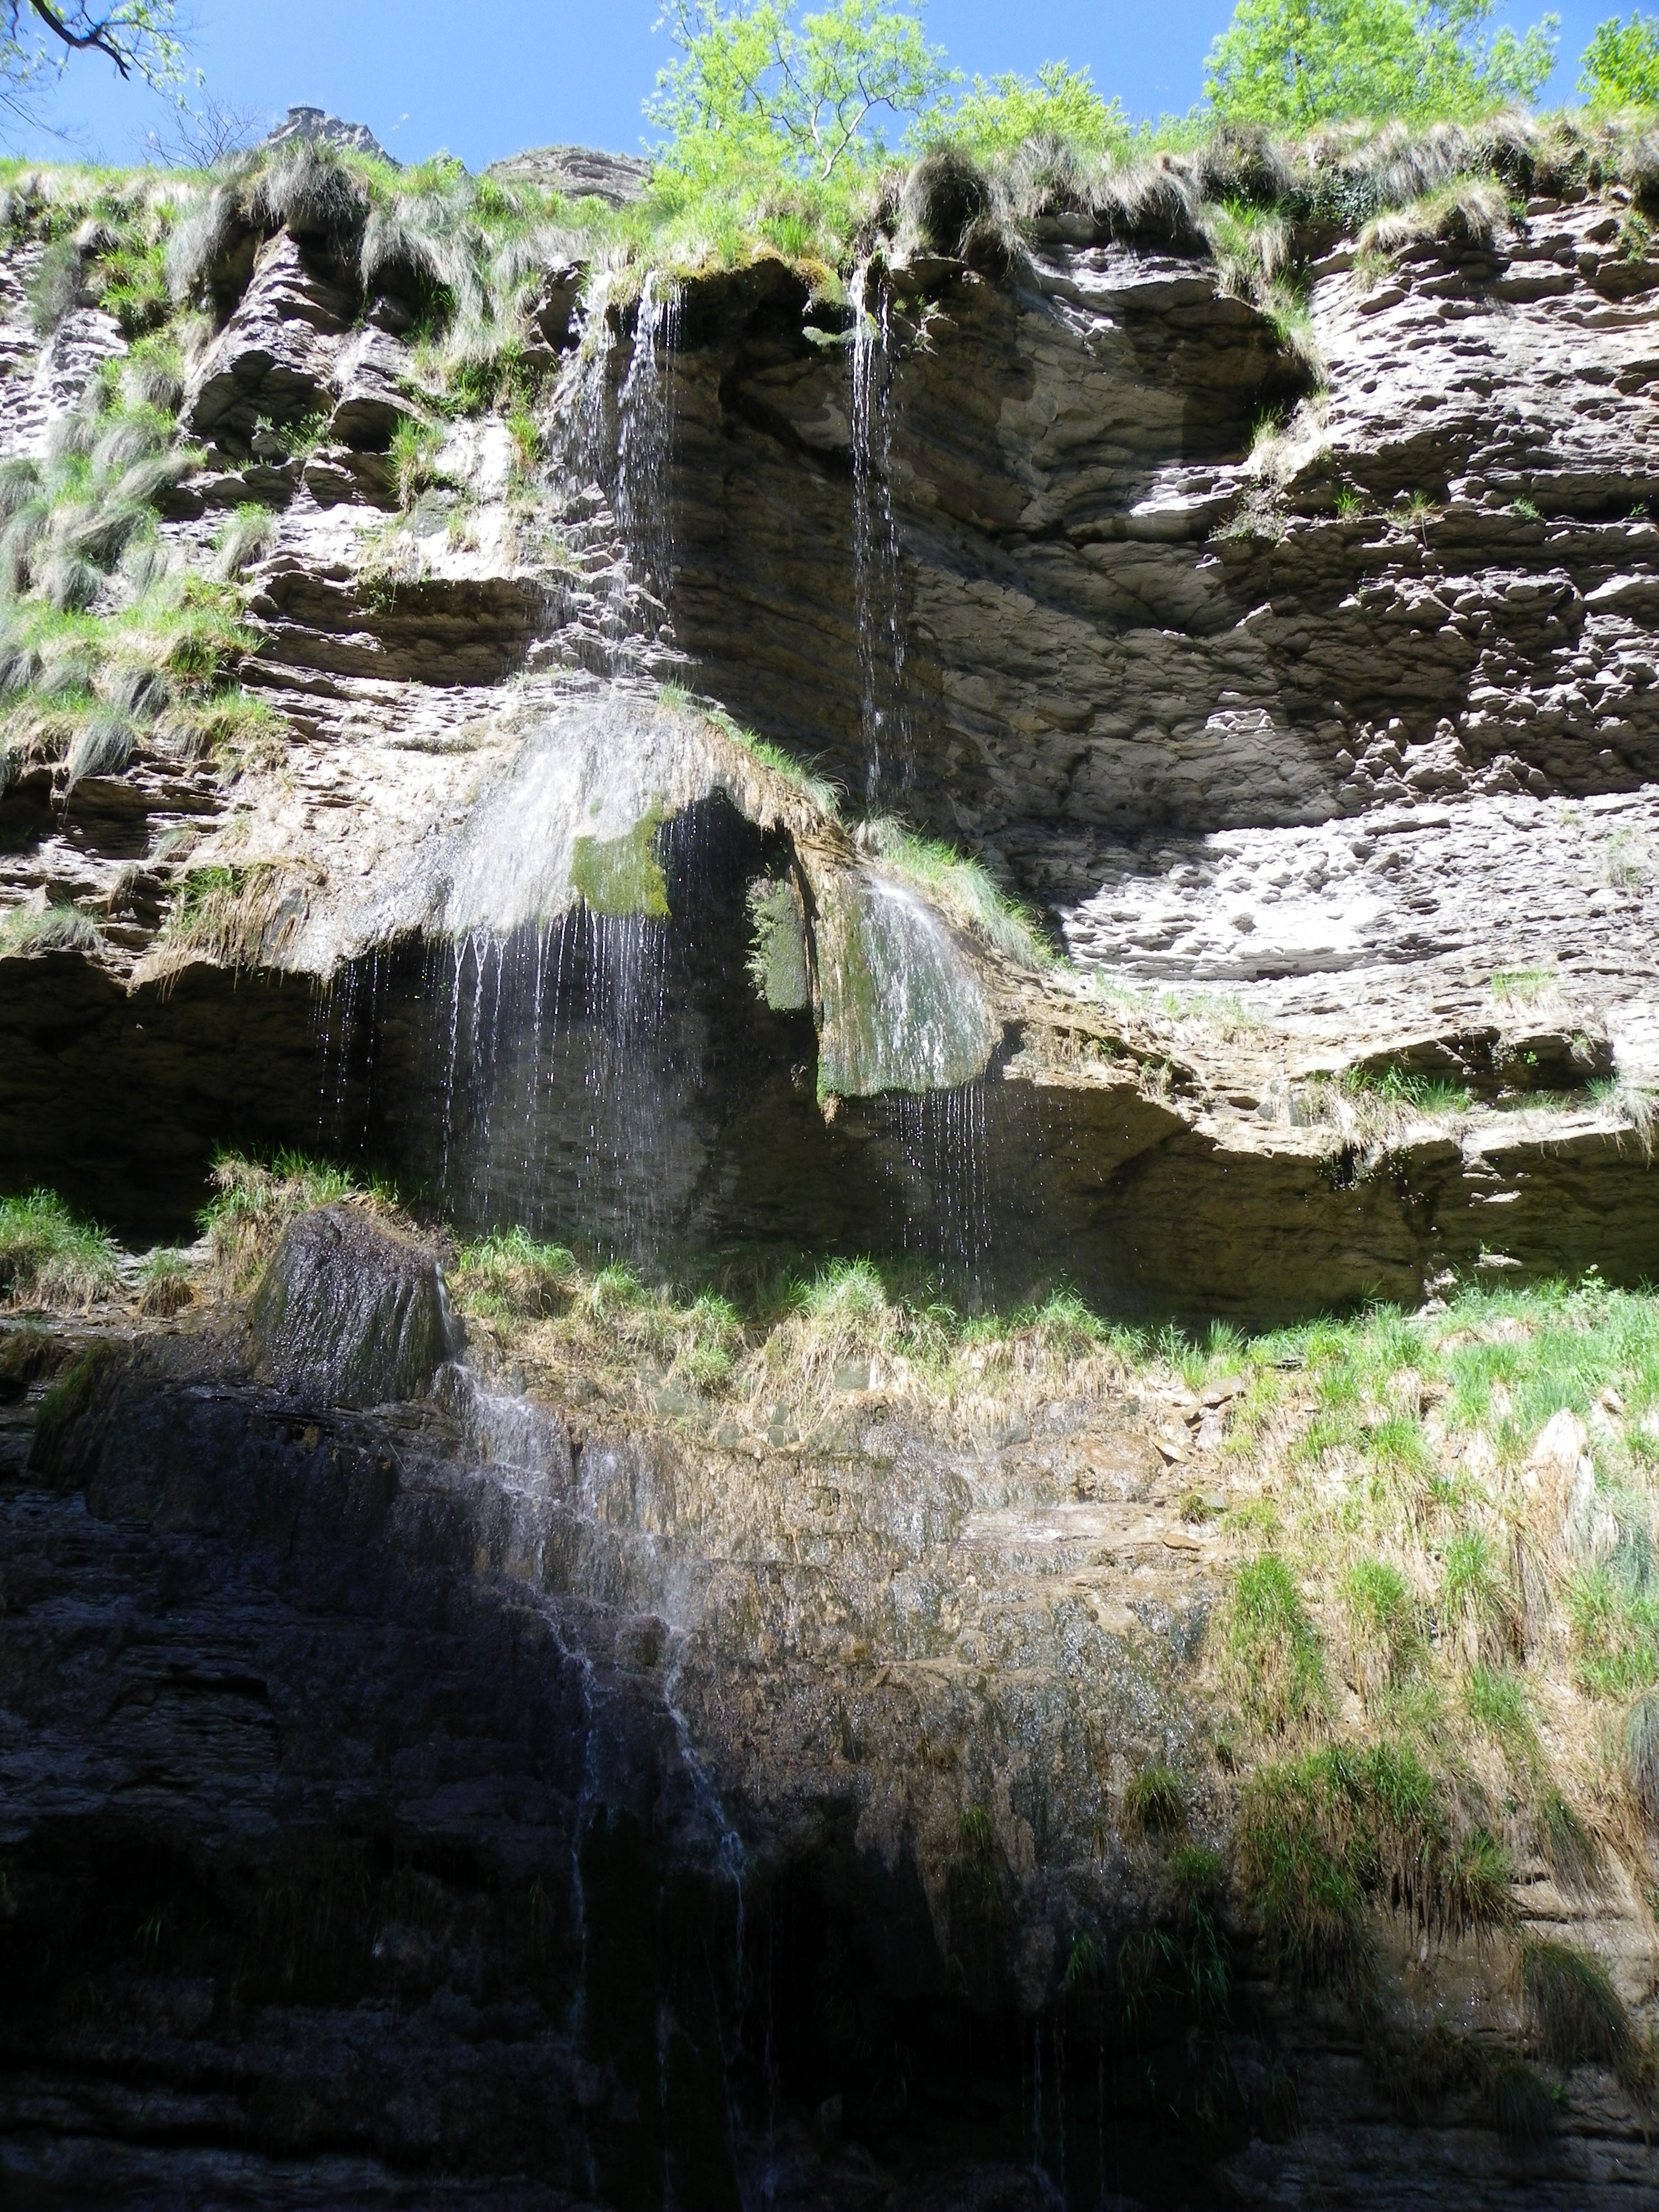 Salto Del Nervión, Álava, España. Tesoros de la naturaleza: Las cascadas más hermosas de España